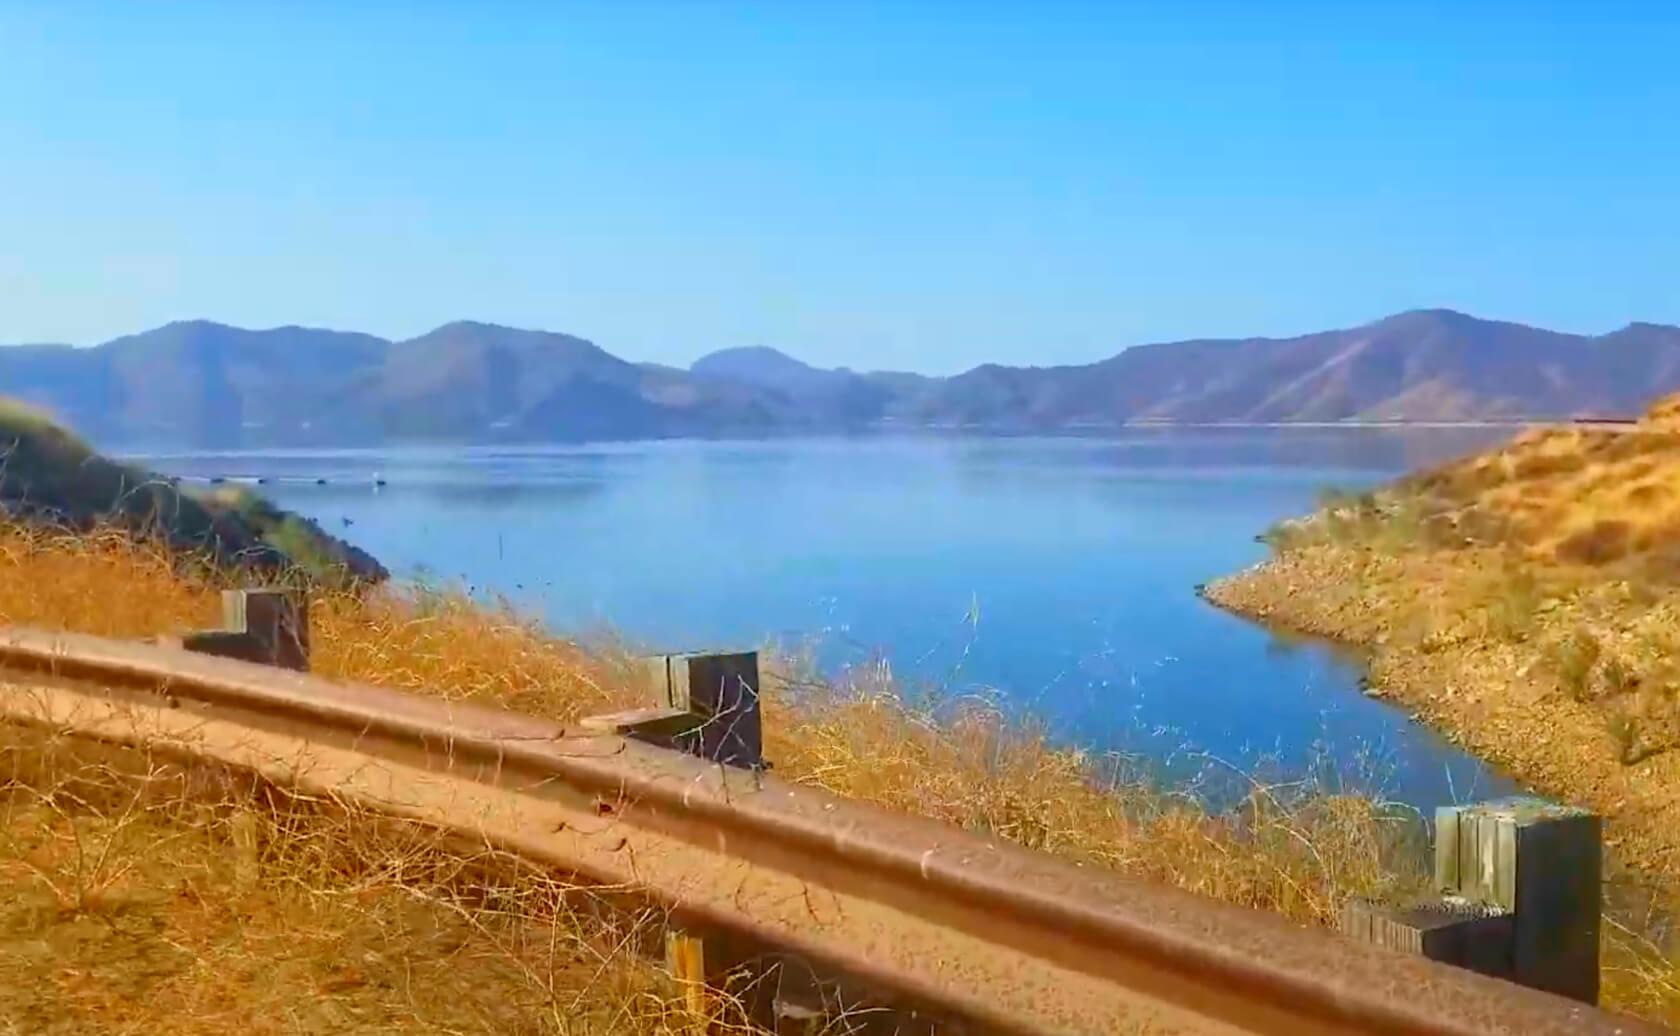 Diamond-Valley-Lake-Fishing-Guide-Report-Hemet-CA-09